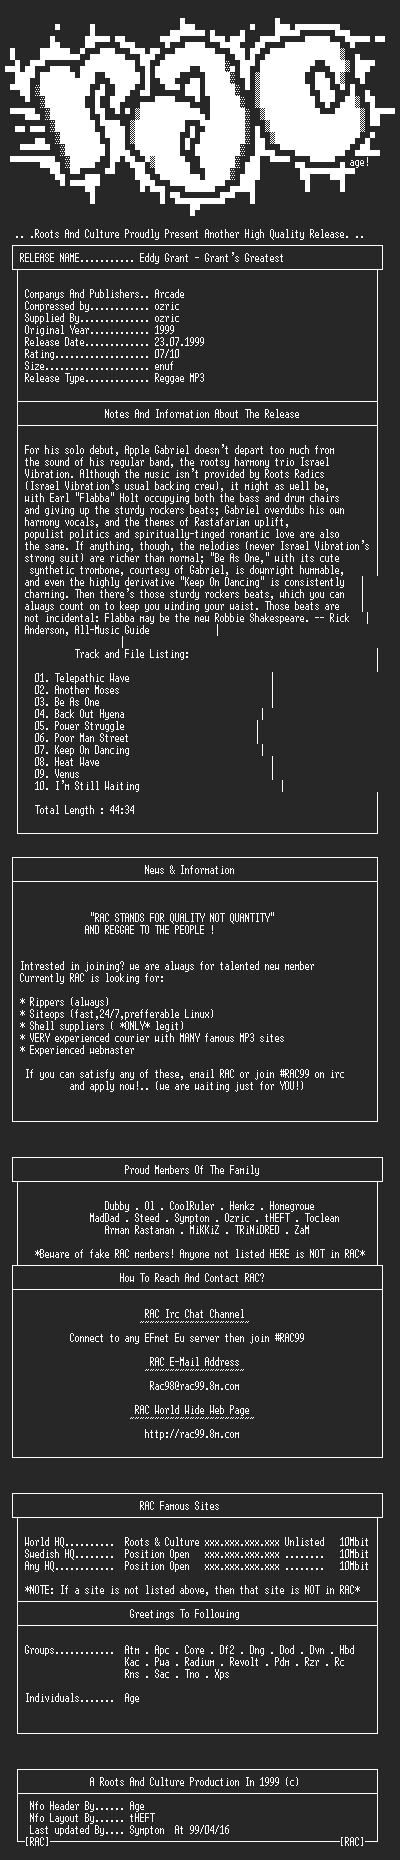 NFO file for Eddy_Grant-Grants_Greatest-(1999)-RAC99